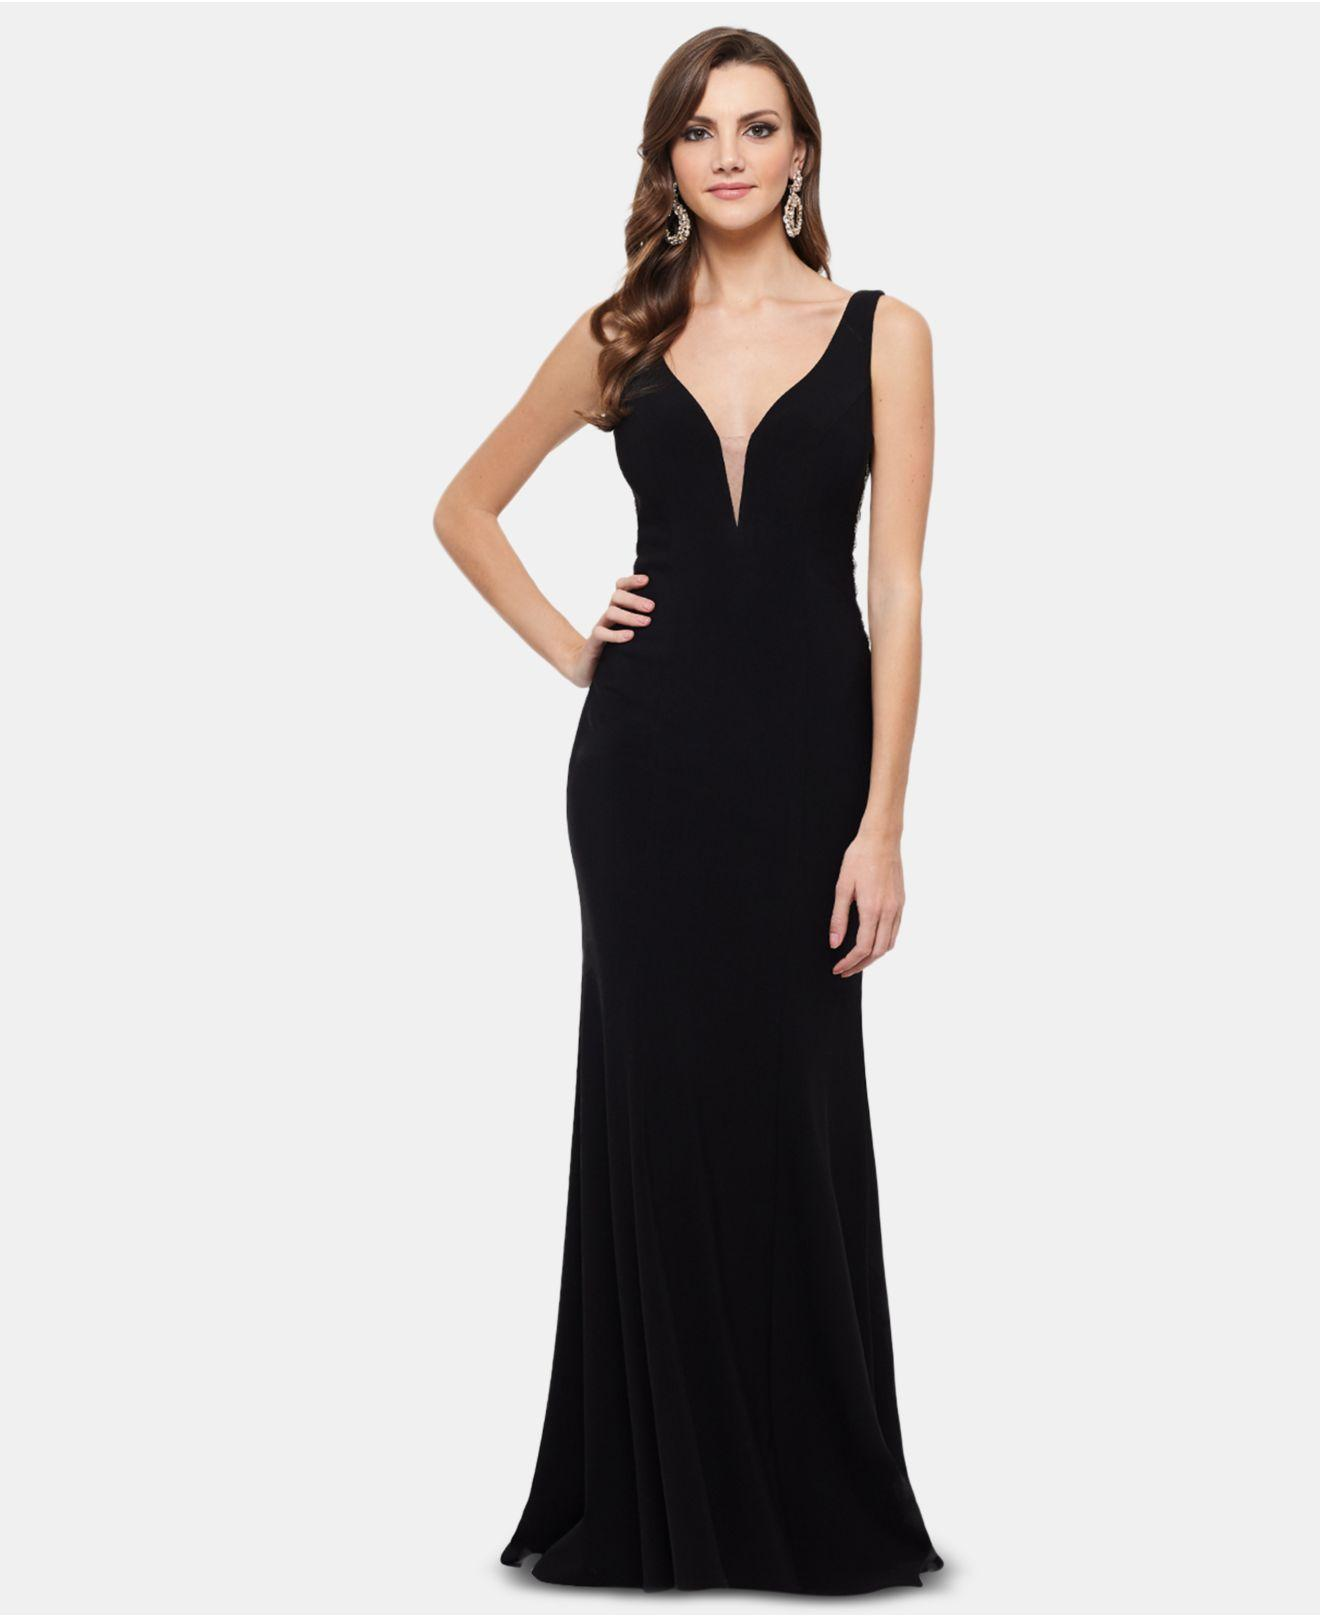 a293ddd6b2d27 Xscape Embellished Cutout Gown in Black - Lyst